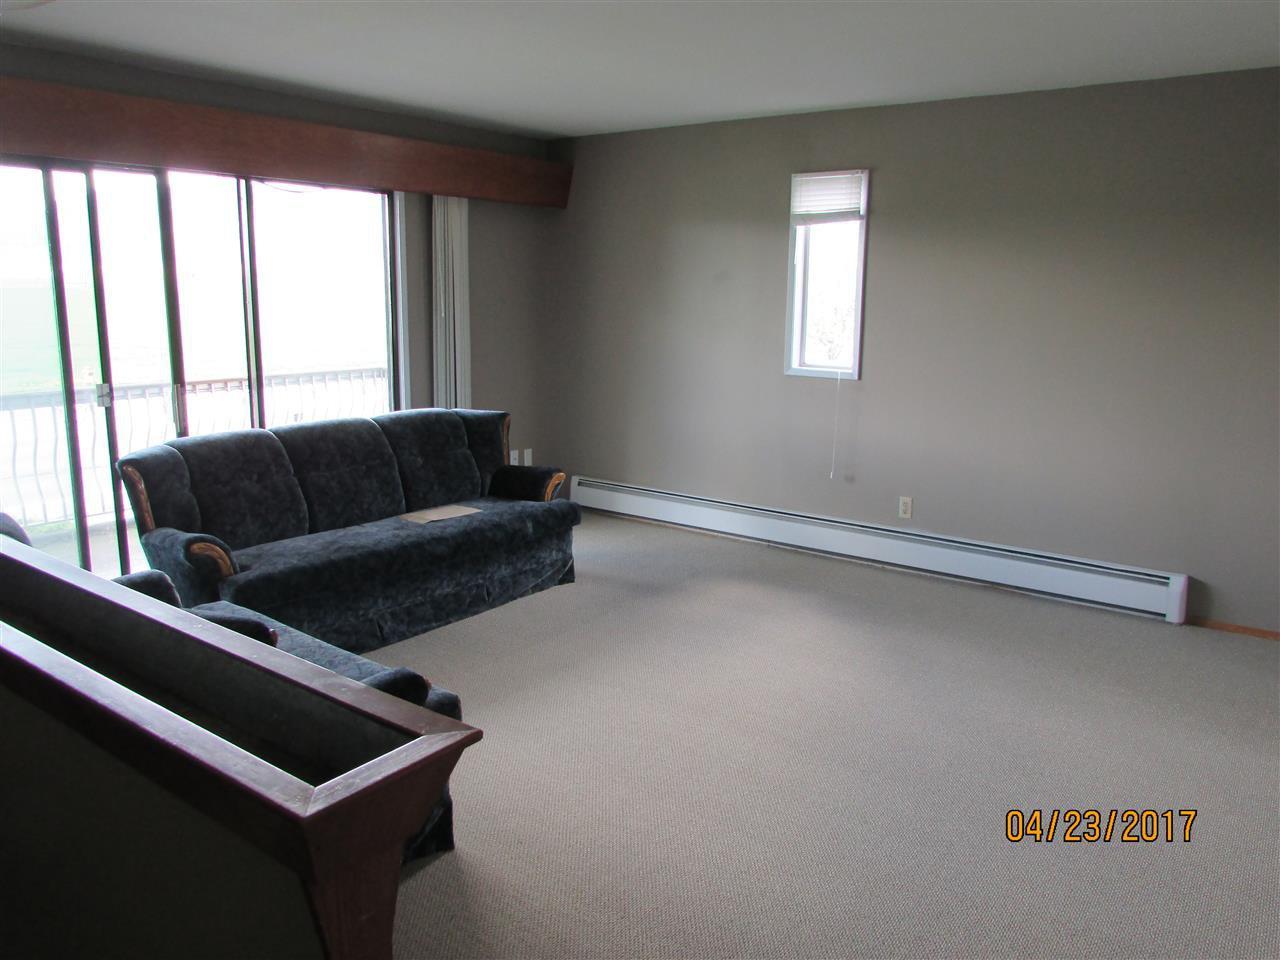 Photo 13: Photos: 7220 EVANS Road in Sardis: Sardis West Vedder Rd House for sale : MLS®# R2160379